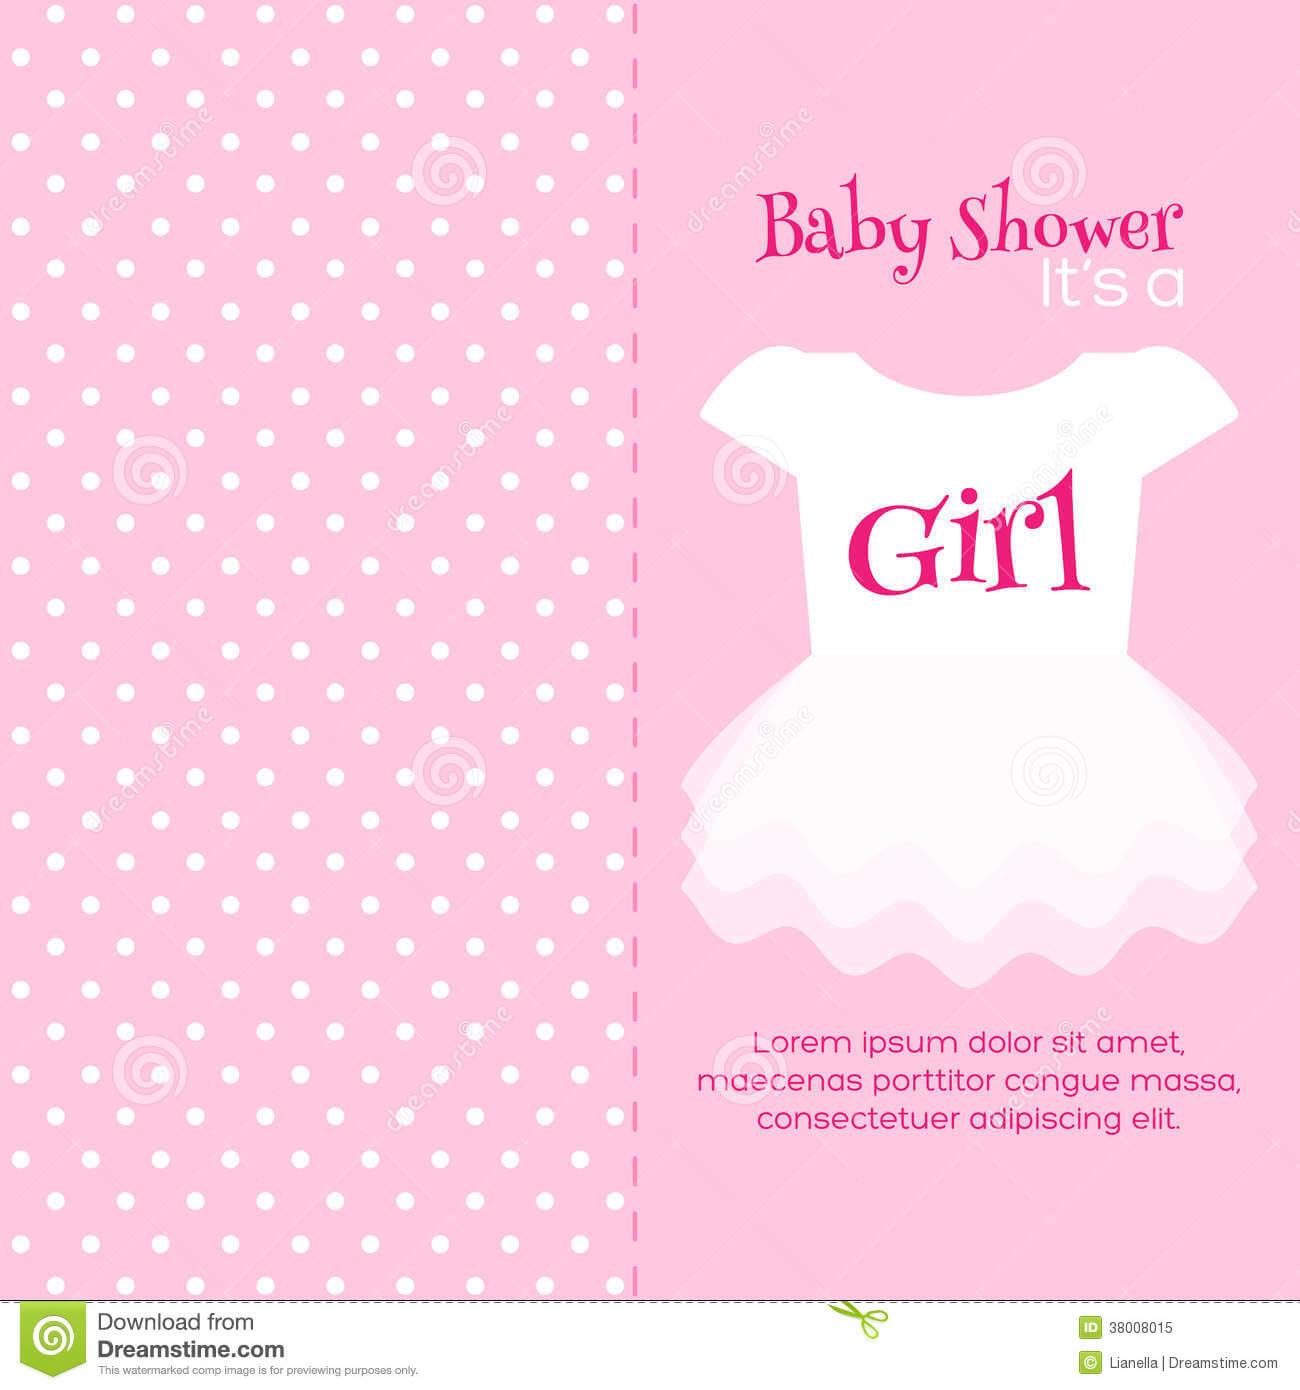 006 Template Ideas Free Baby Shower Invitation Fascinating With Regard To Free Baby Shower Invitation Templates Microsoft Word